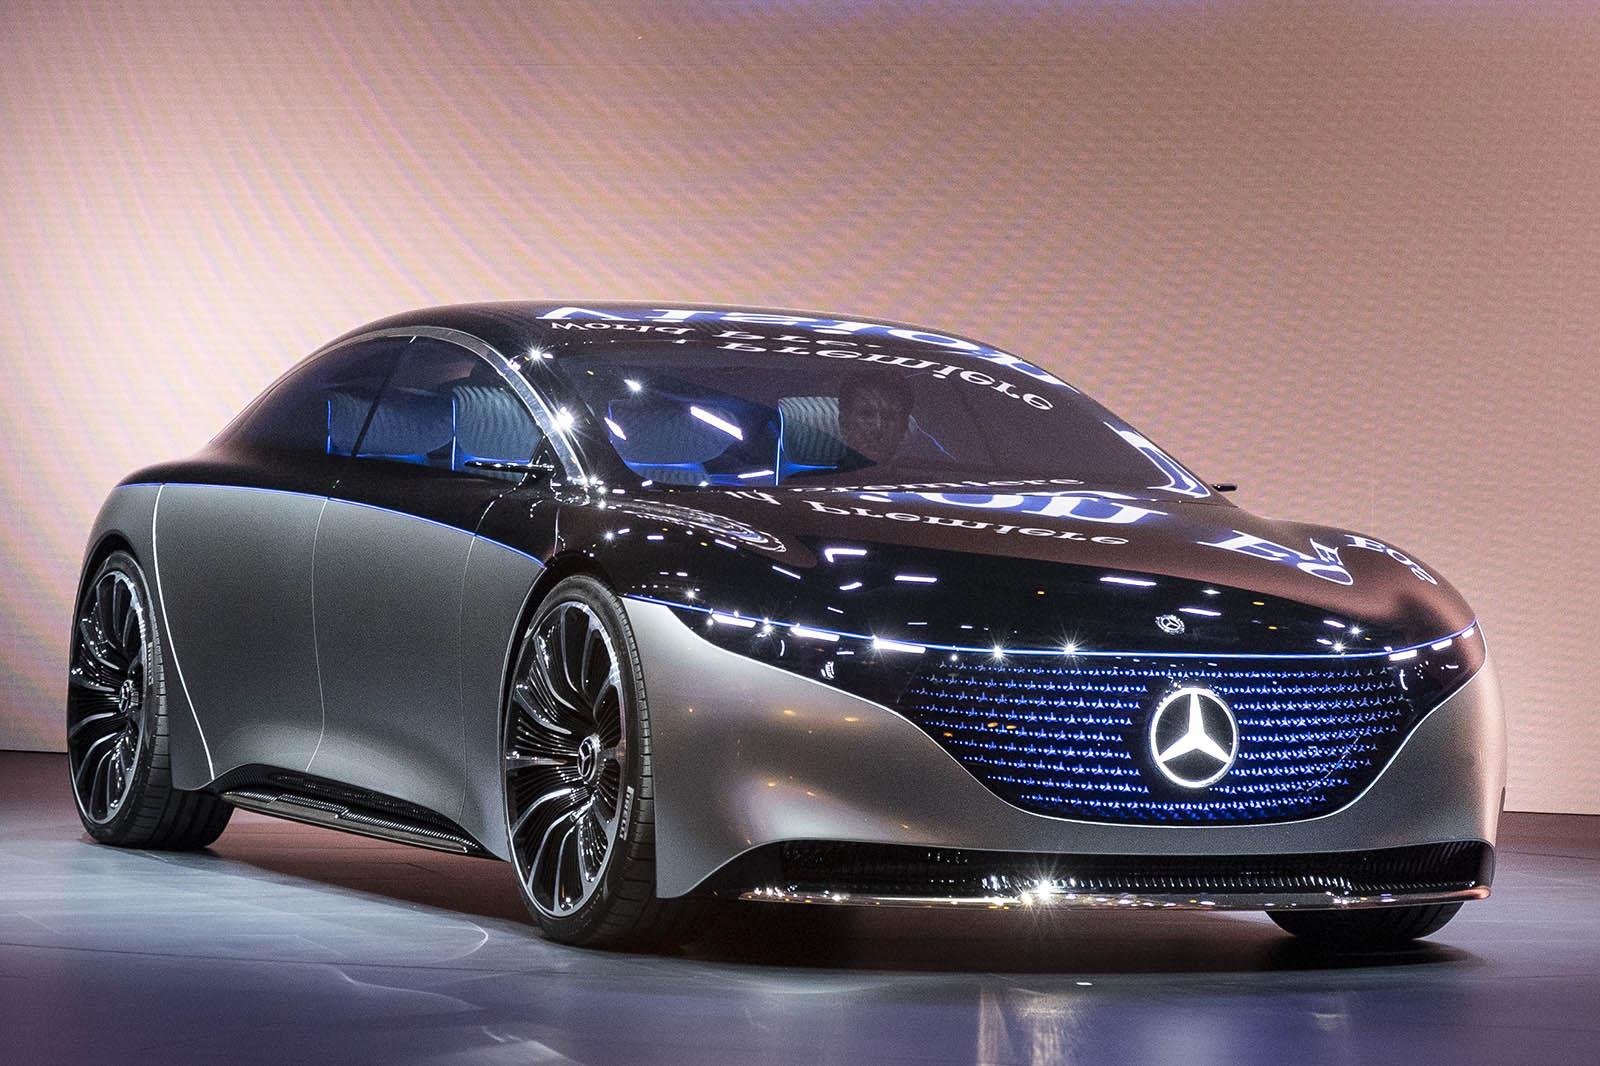 New Mercedes-Benz Vision EQS concept is 470bhp luxury EV ...